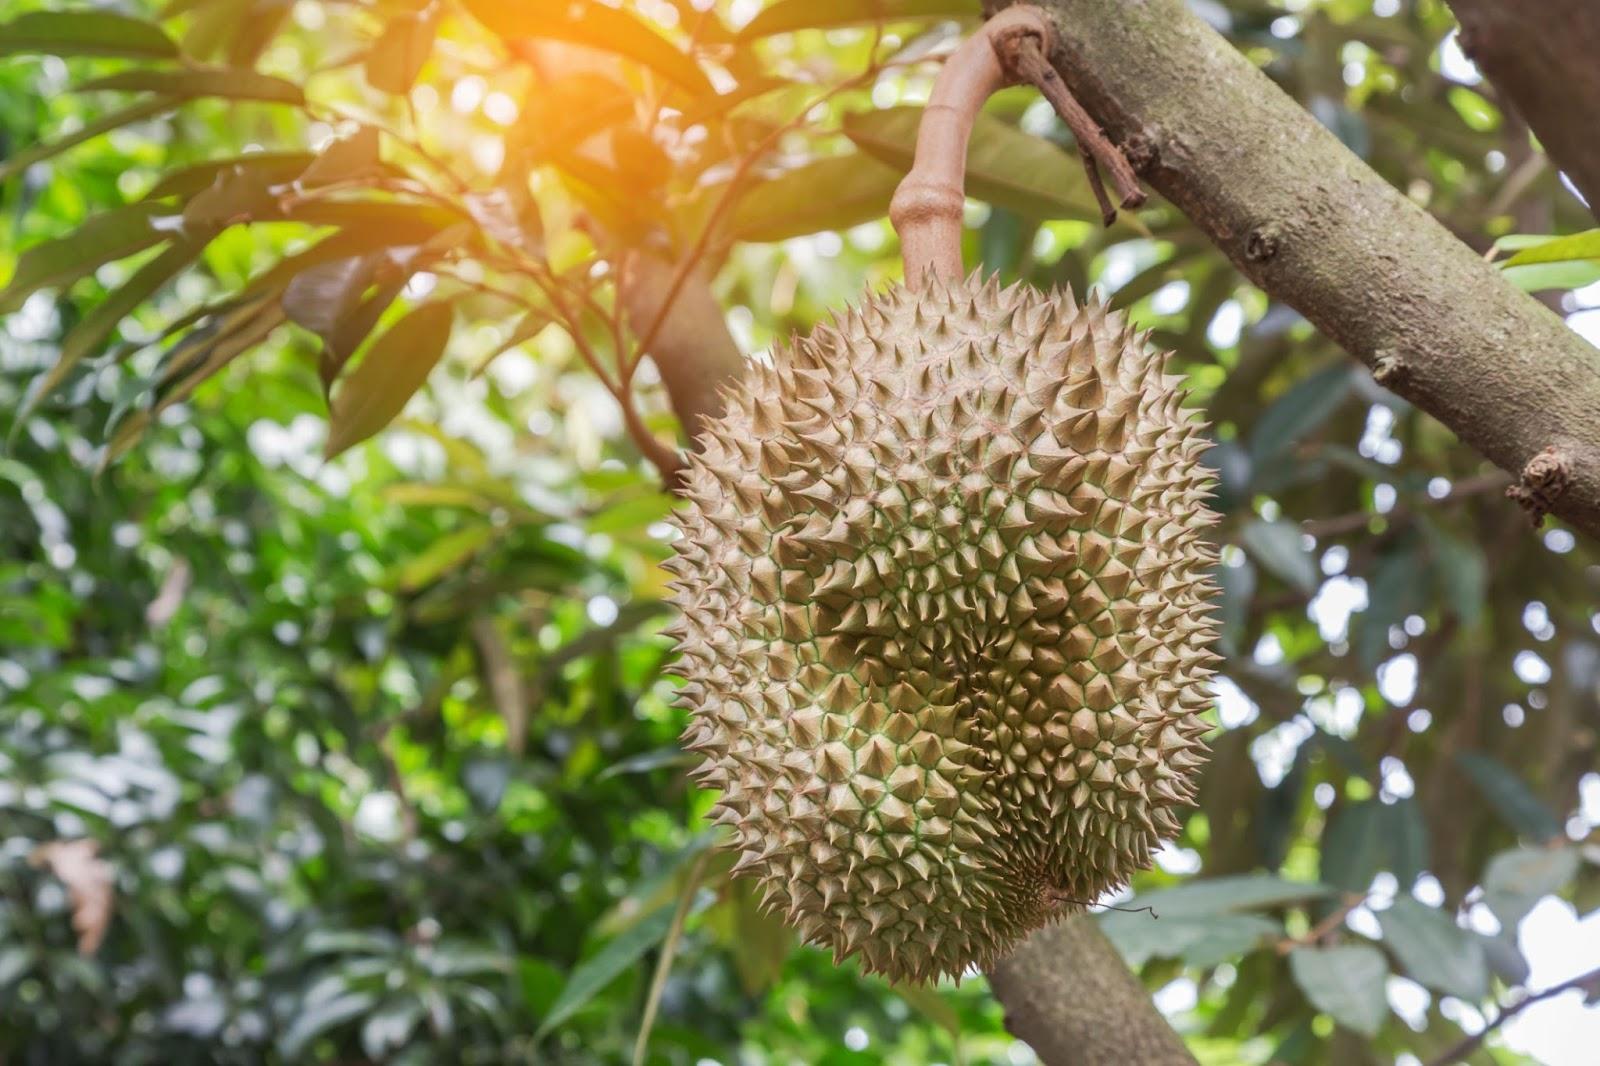 Jenis buah durian